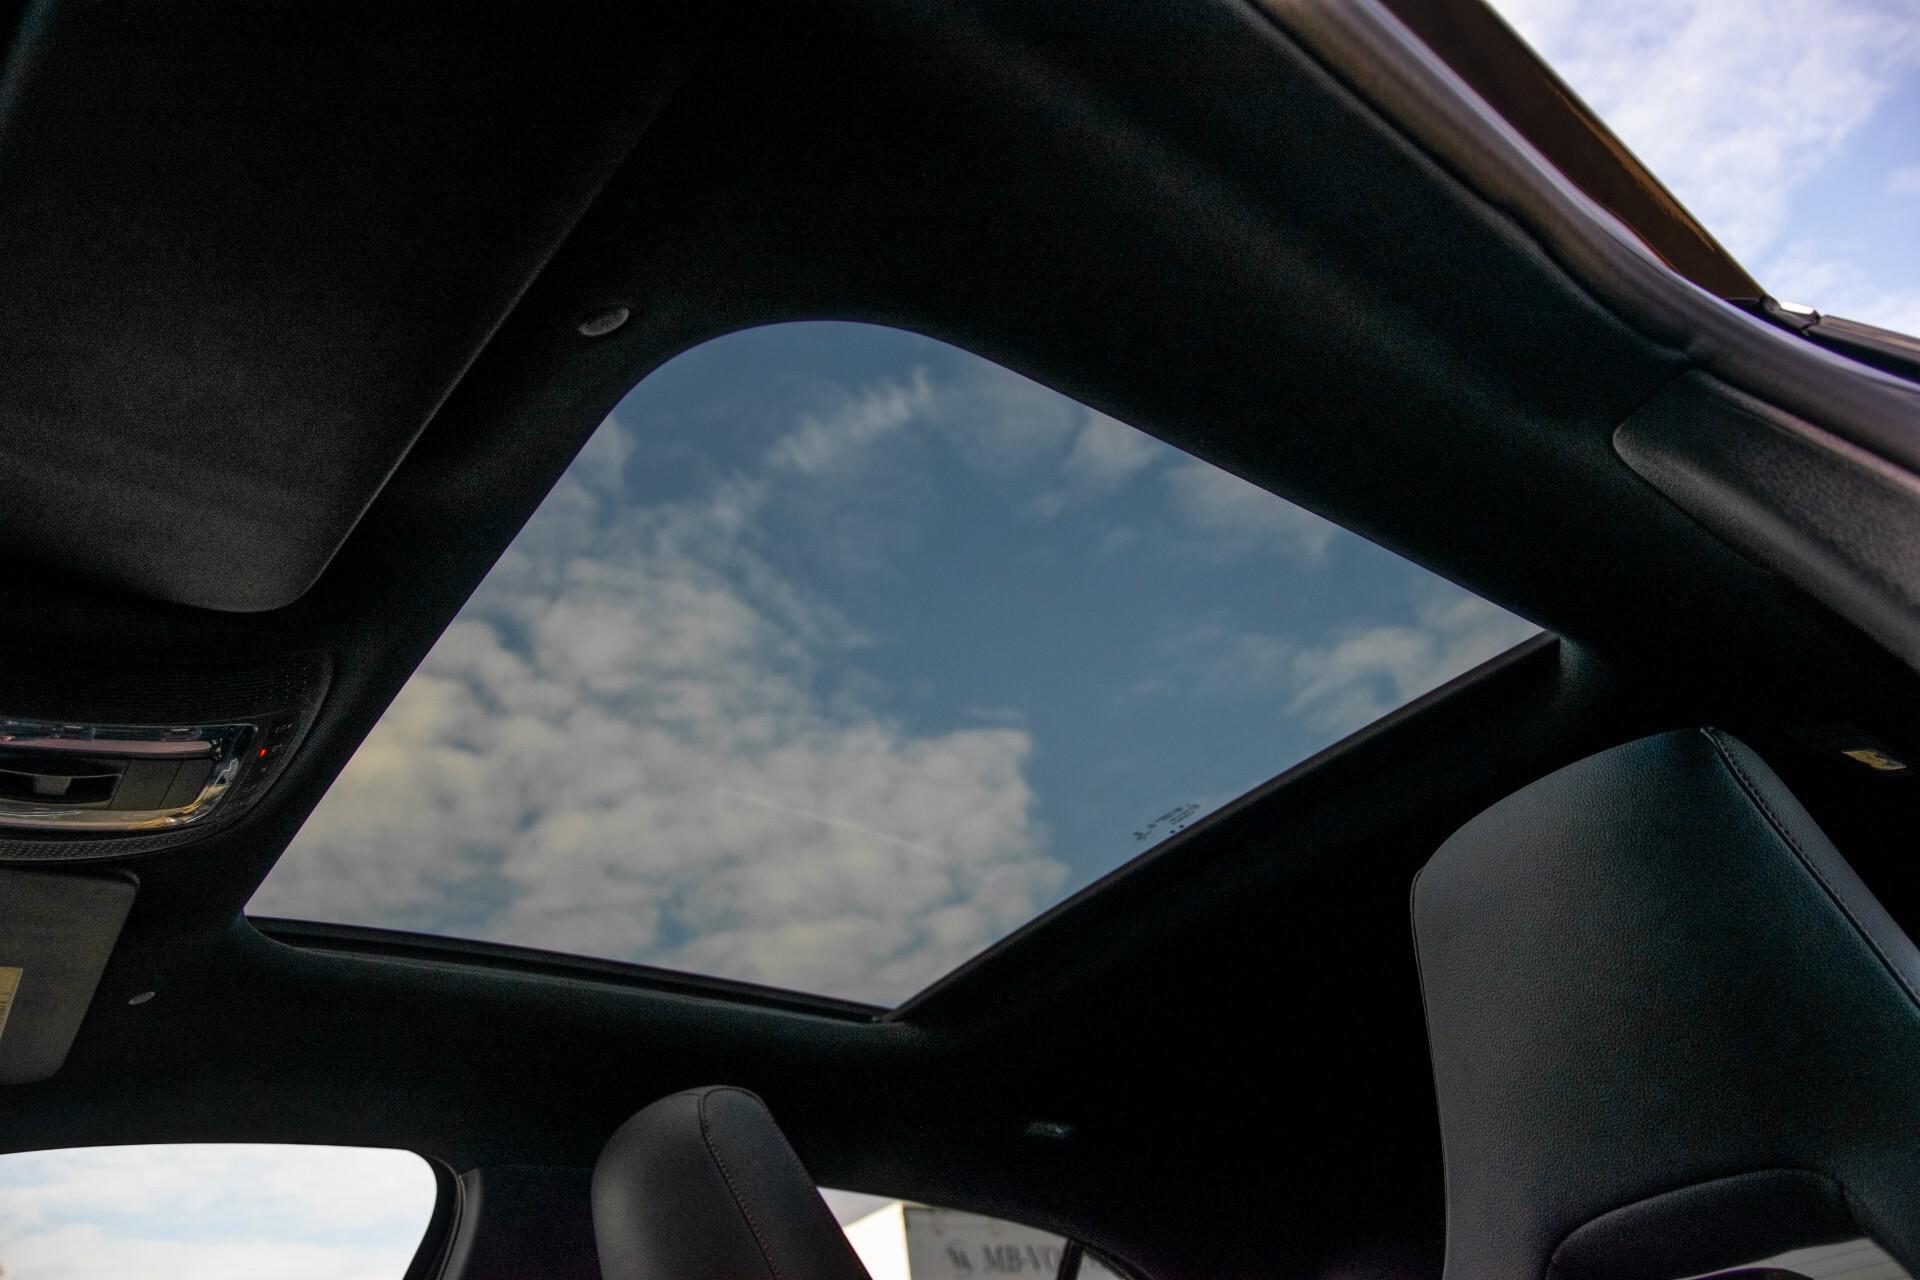 Mercedes-Benz A-Klasse 250 4-M AMG Panorama/Keyless-Entry/MBUX/HUD/Burmester/360/Multibeam LED Aut7 Foto 52